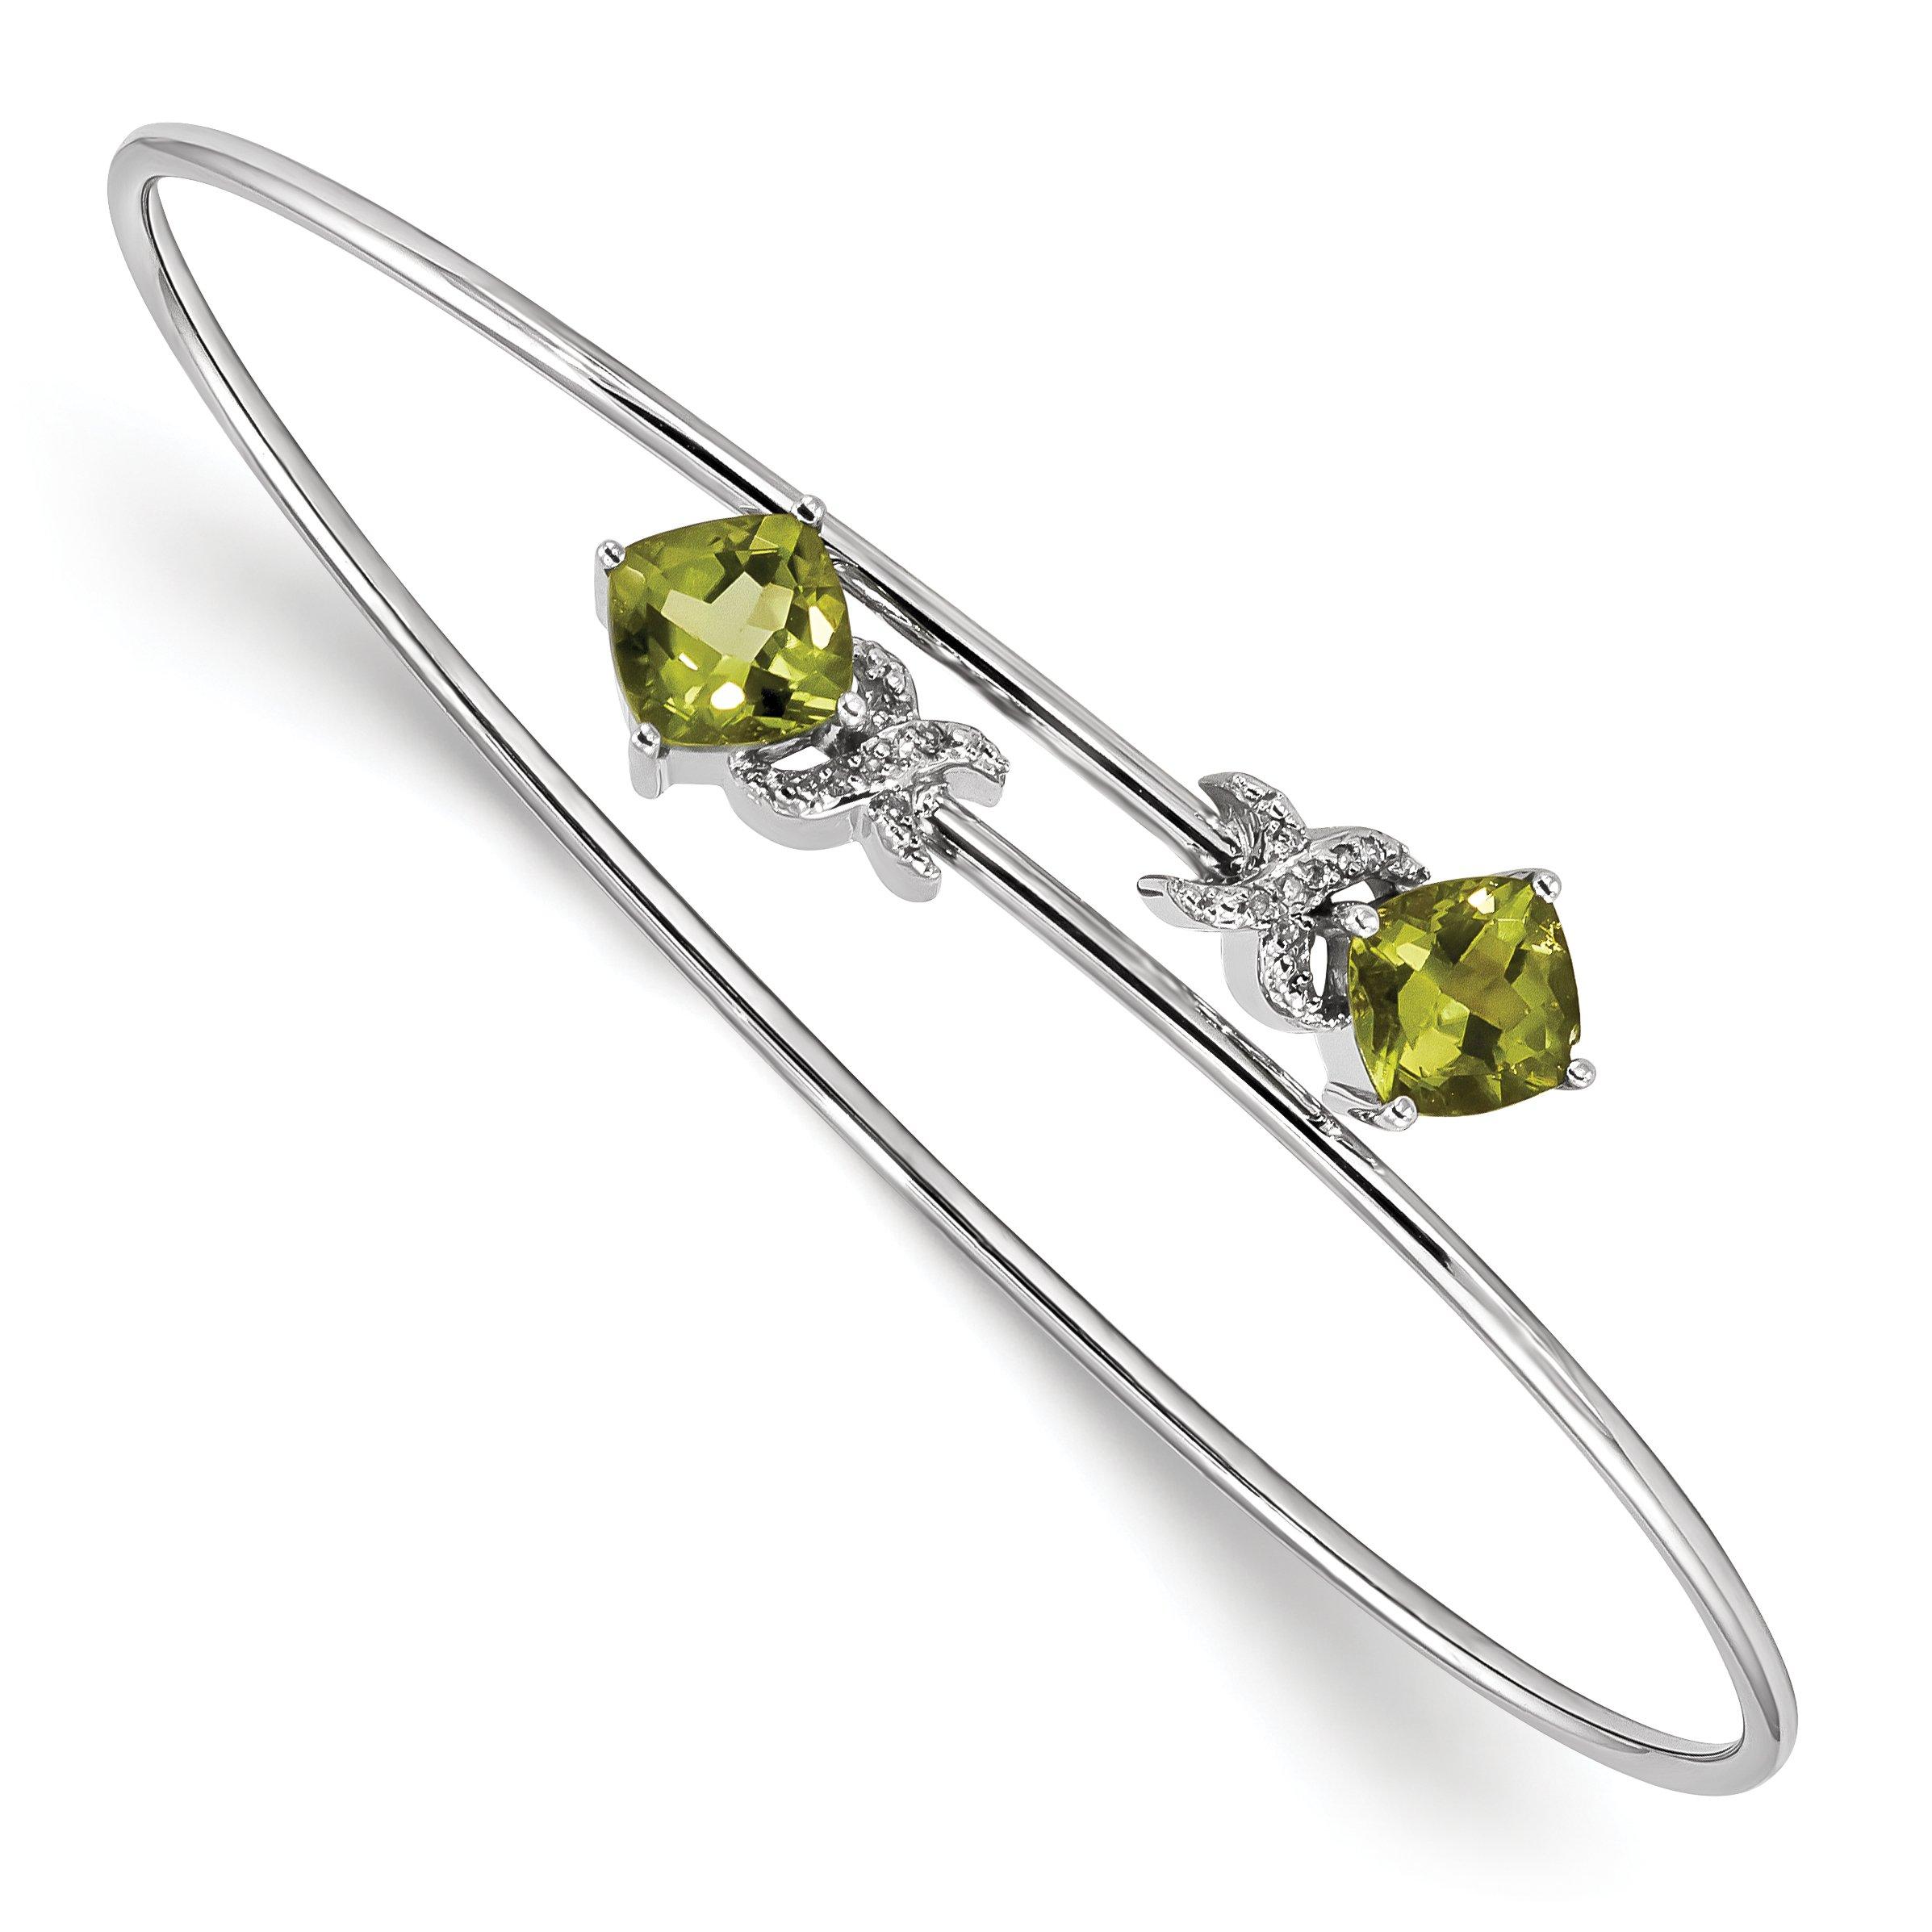 ICE CARATS 14k White Gold 0.03ct Diamond 2.4ct Green Peridot Flexible Bangle Bracelet Cuff Expandable Stackable Gemstone Fine Jewelry Gift Set For Women Heart